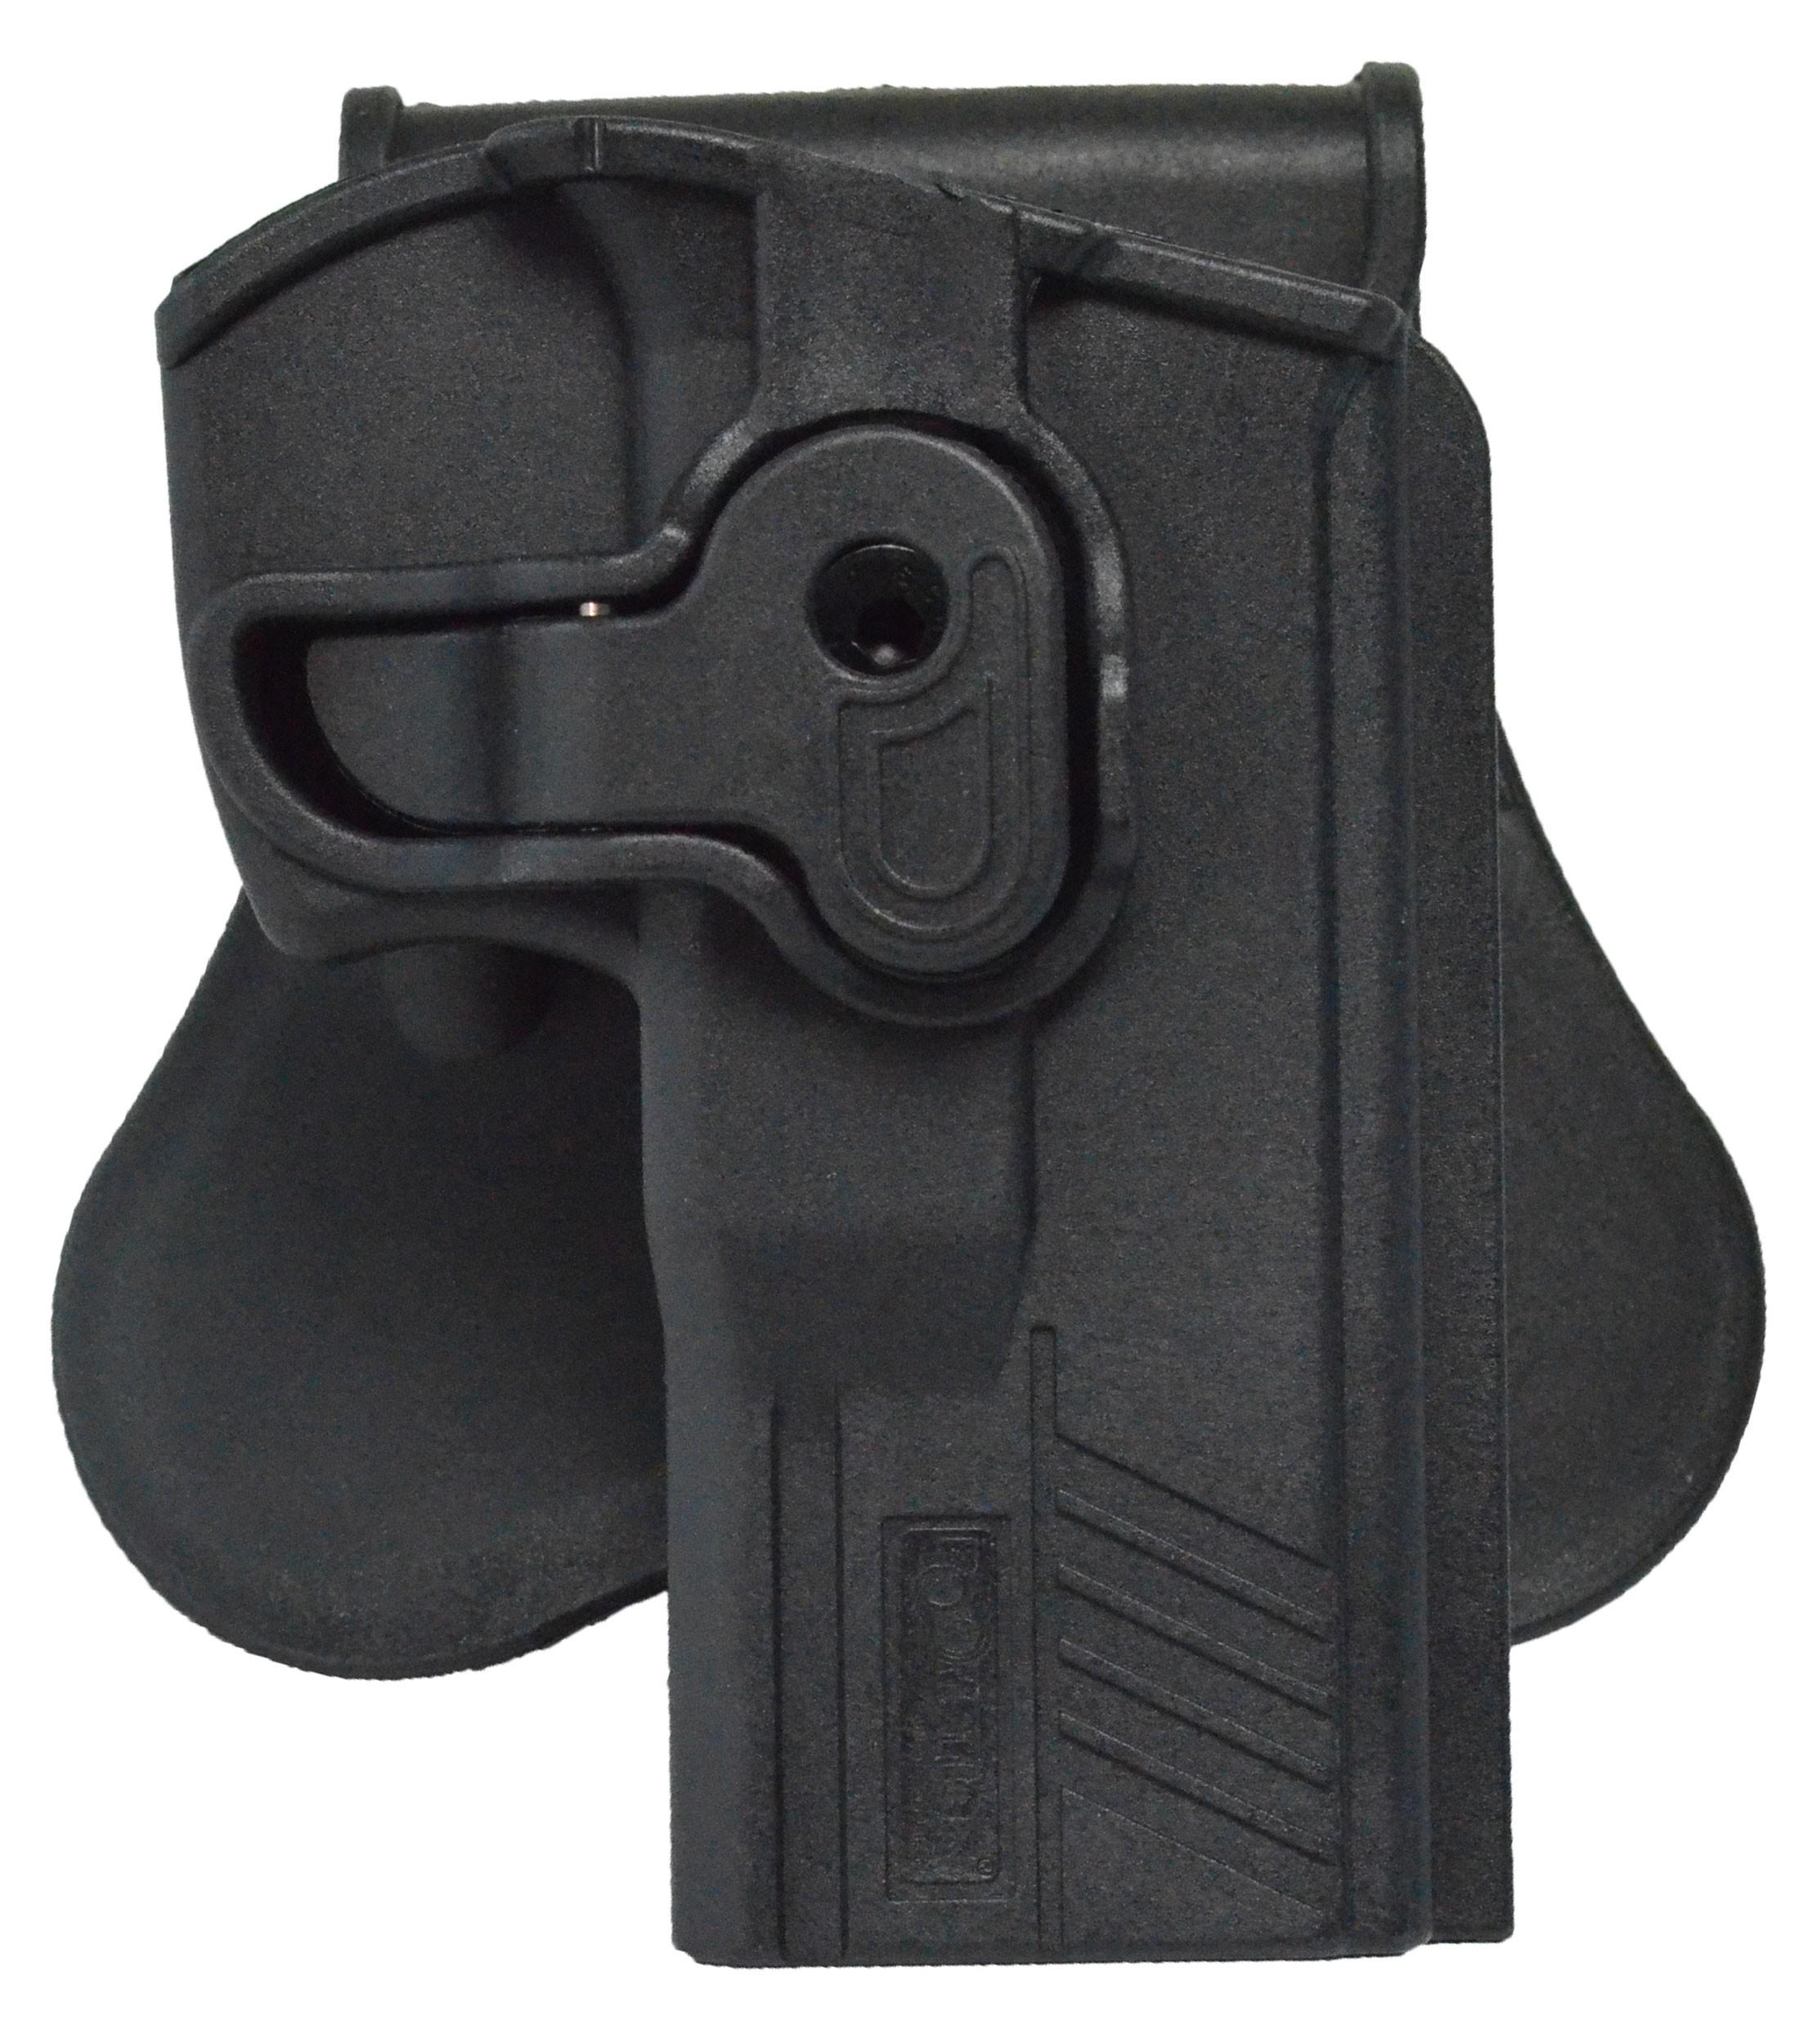 Paddle Holster Taurus PT809/PT840/PT845, 247, 24/7 Pro, 24/7 G1 Pistol